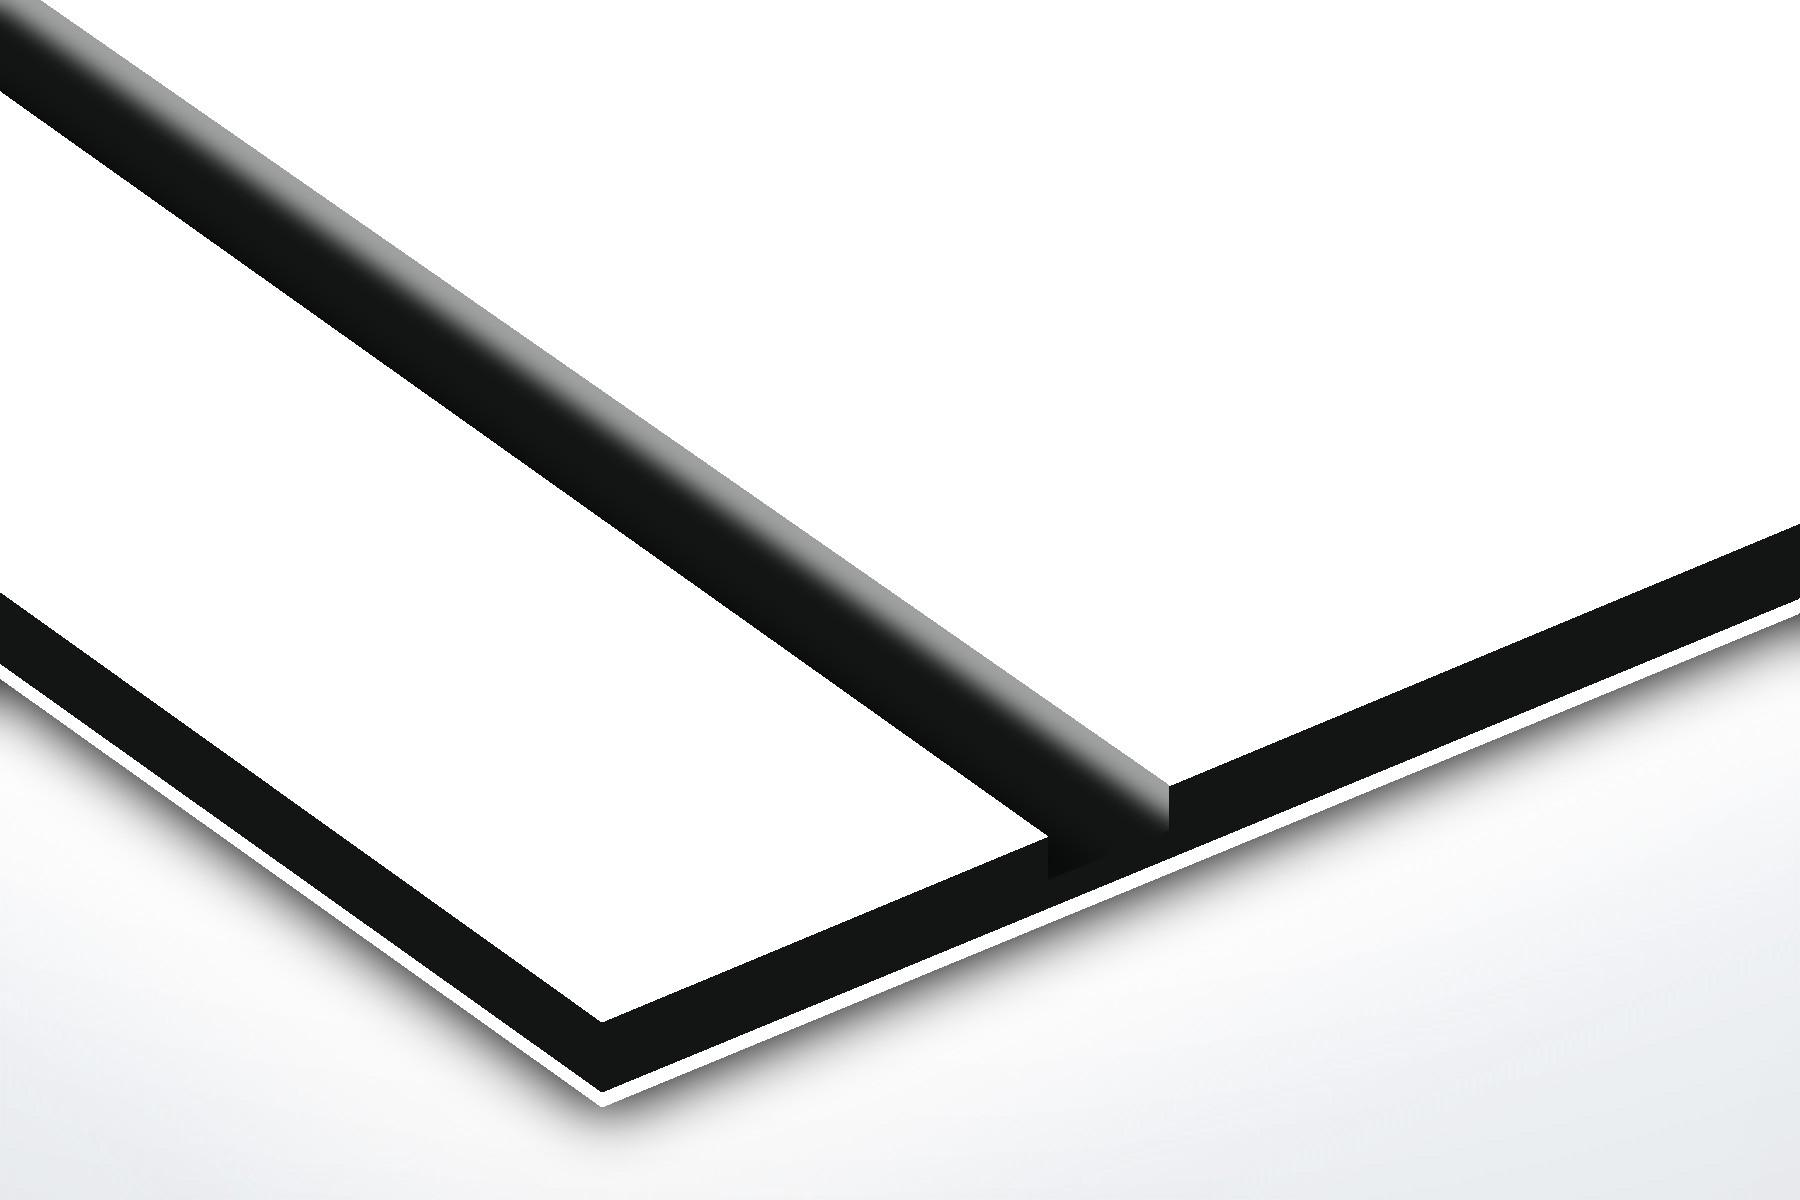 TroPly HiGloss, White/Black/White, 3ply, 3.2 mm